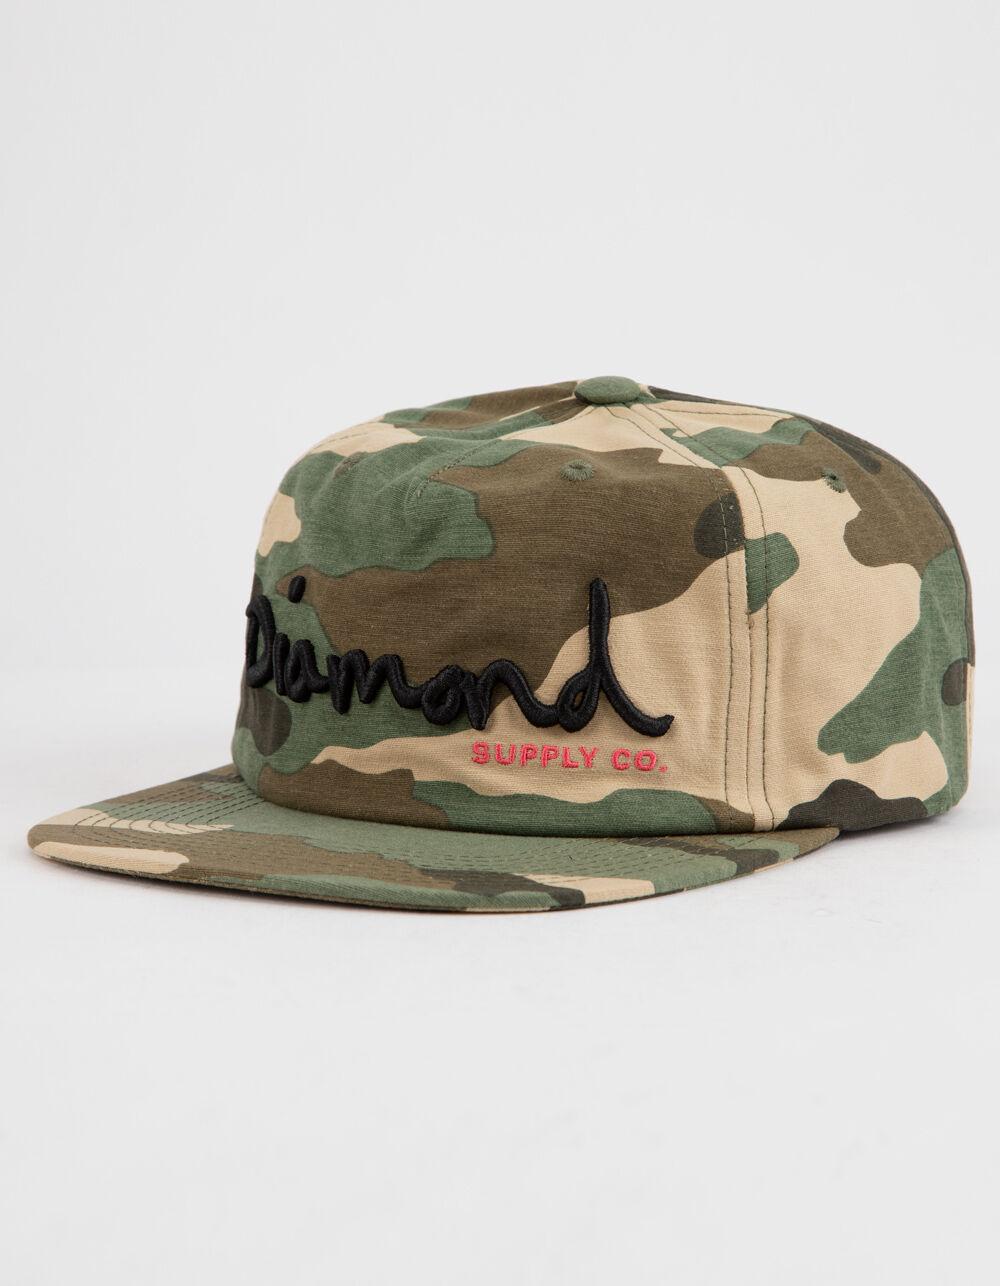 DIAMOND SUPPLY CO. OG Scrip Camo Strapback Hat